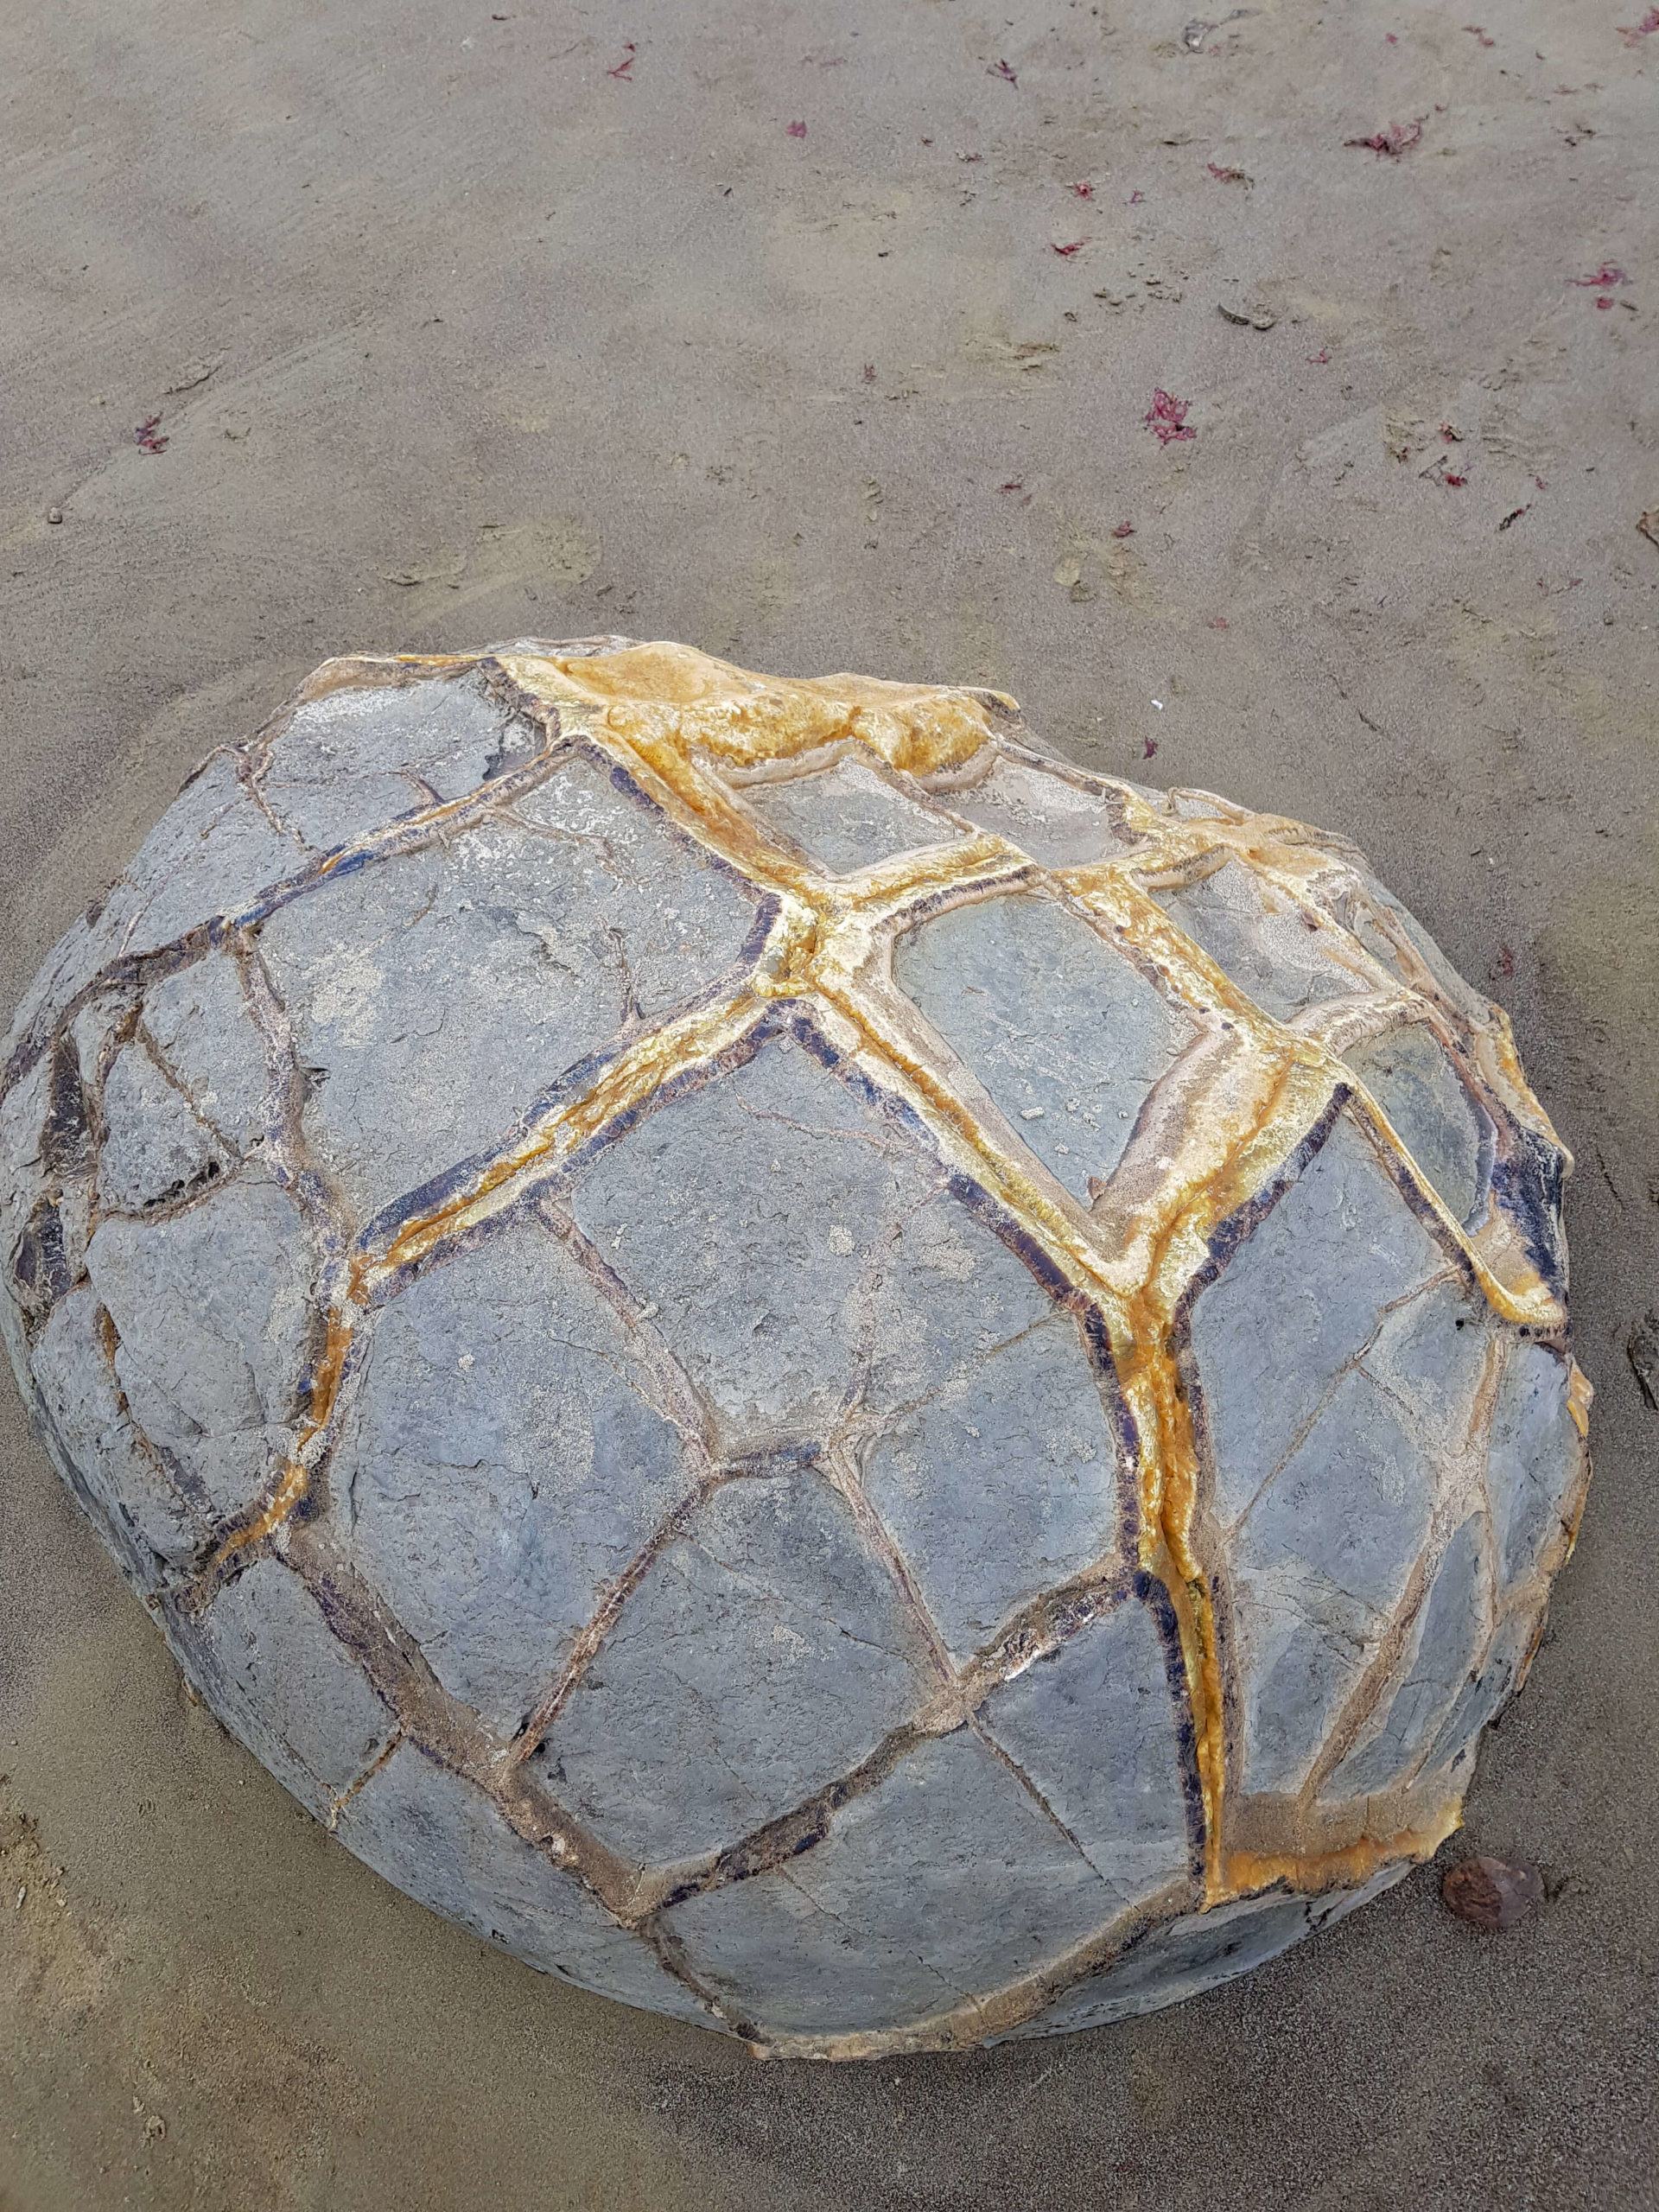 Moeraki boulders rocher Nouvelle-Zélande